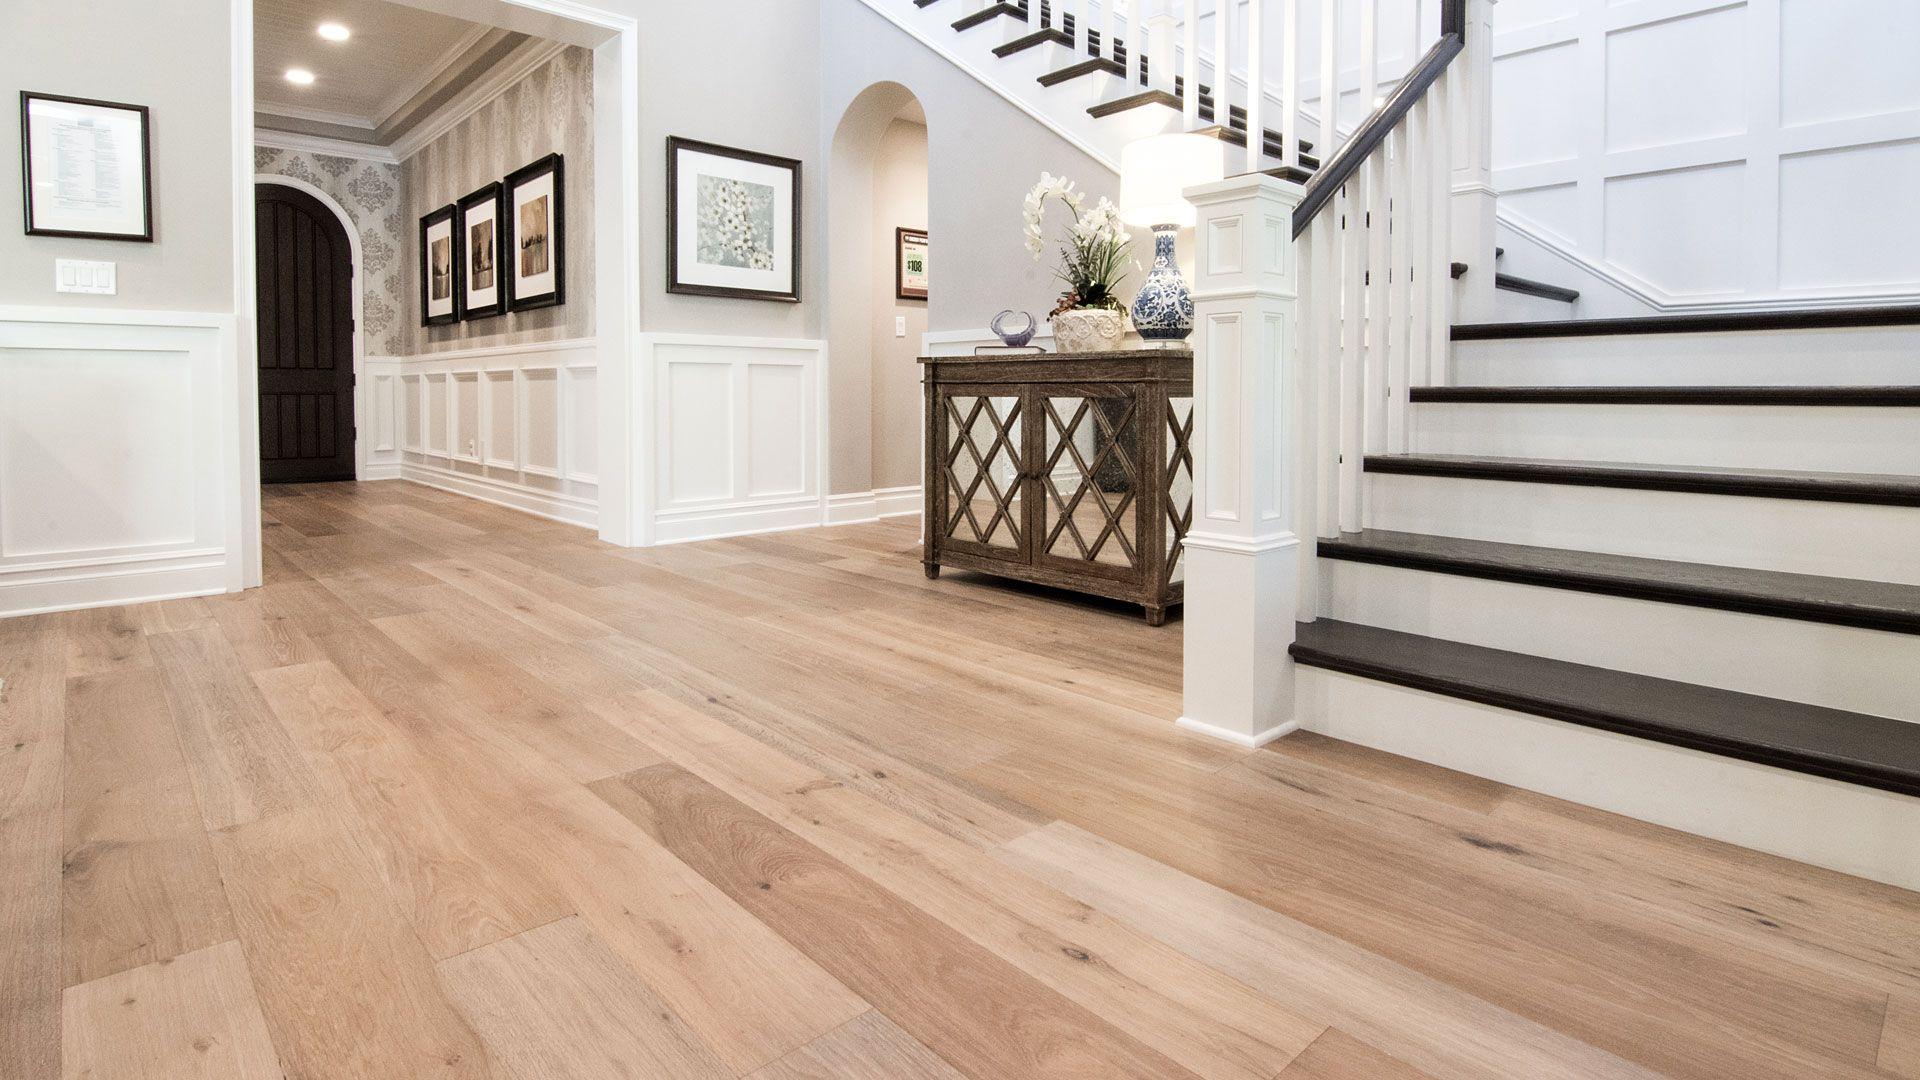 Provenza Hardwood Floors At Vicenza Model Homes | Goldstick ...